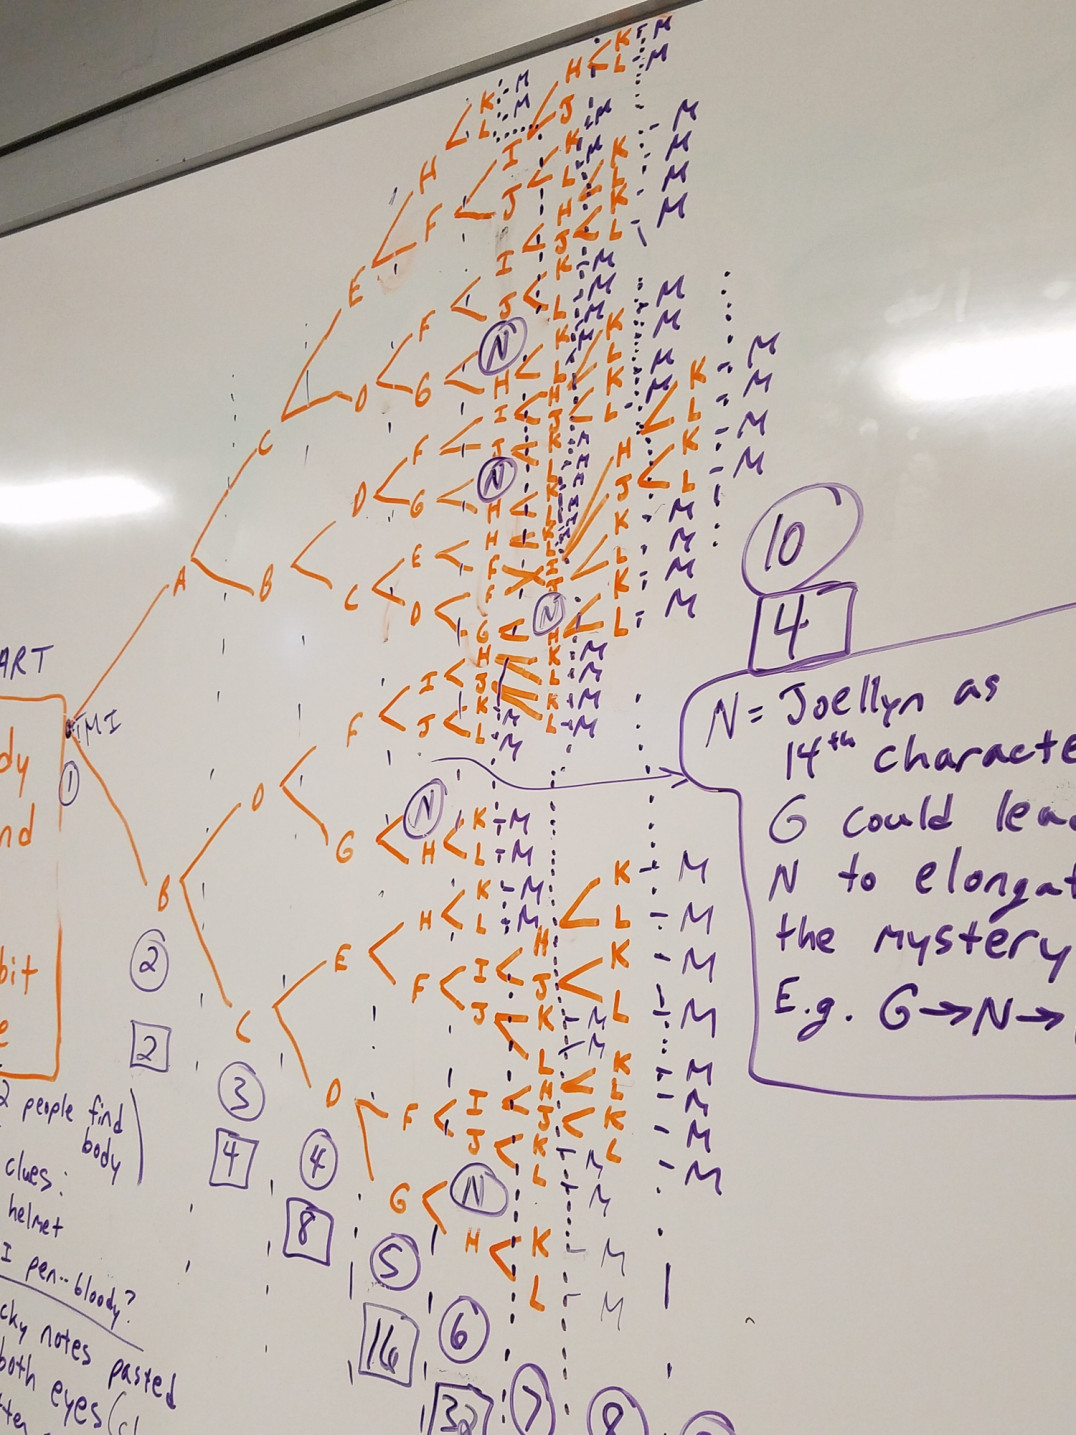 Murder Mystery Decision Tree